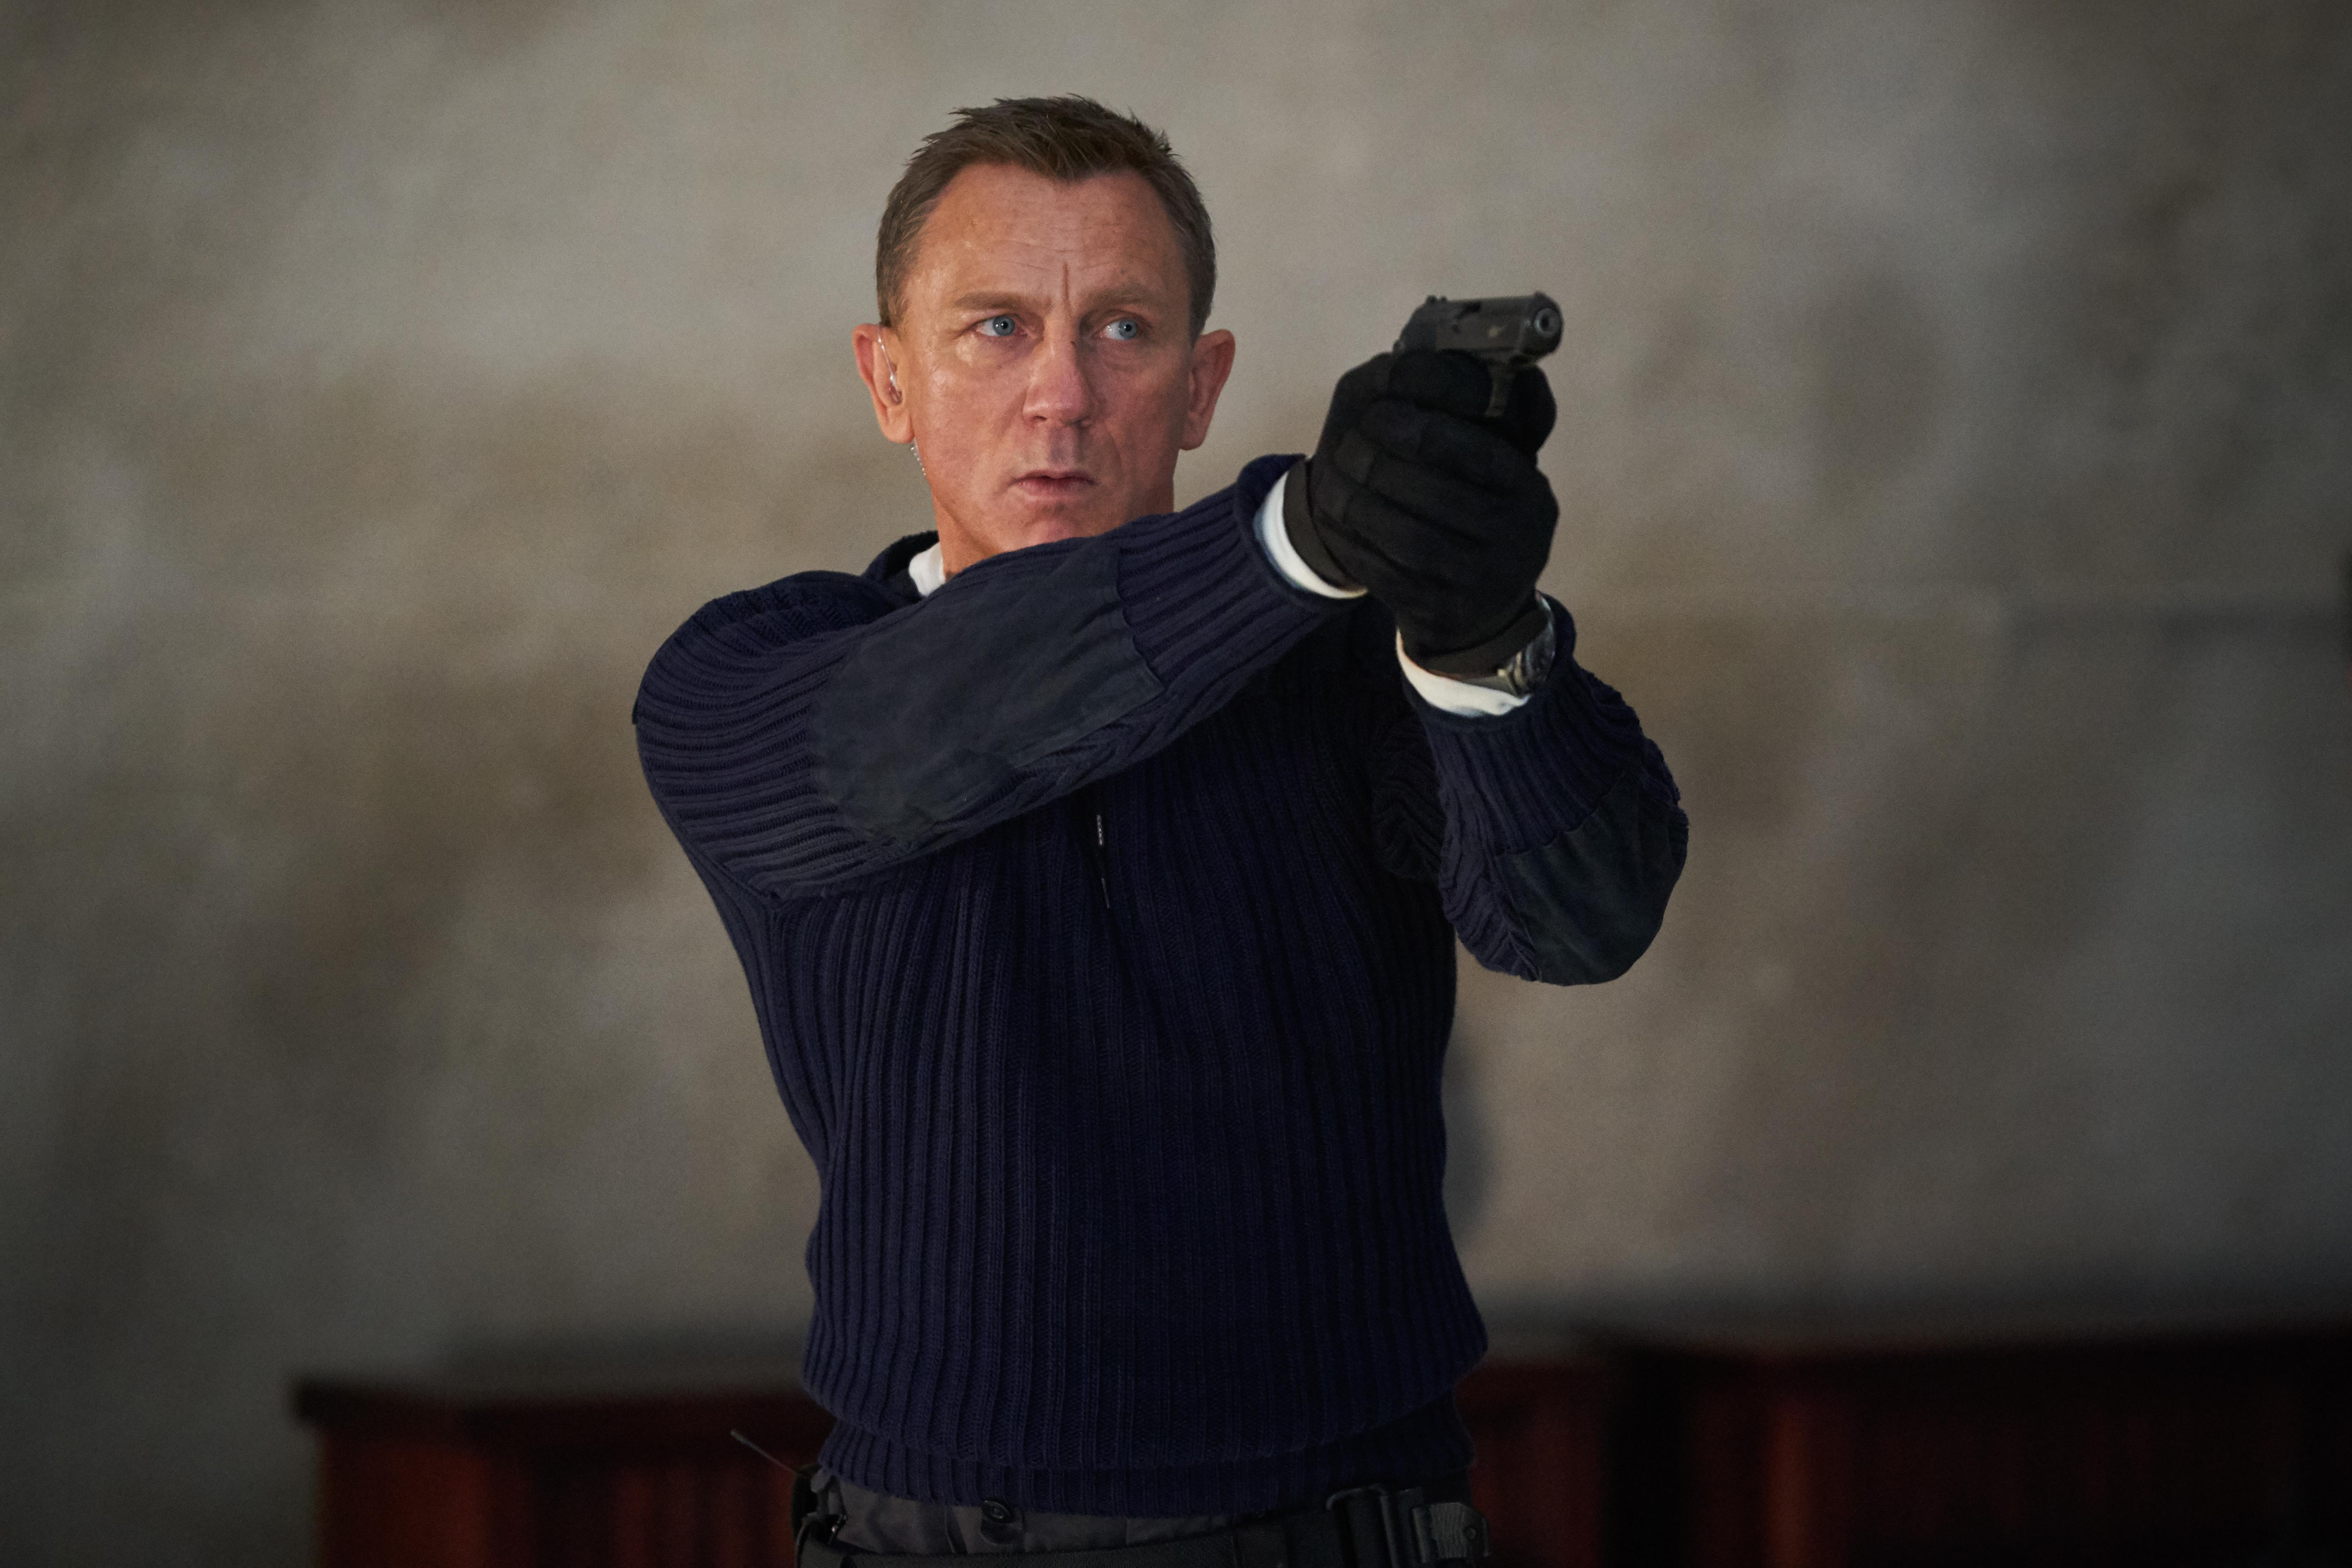 James Bond (Daniel Craig) prepares to shoot in NO TIME TO DIE. (Credit: Nicola Dove. © 2019 DANJAQ, LLC AND MGM)